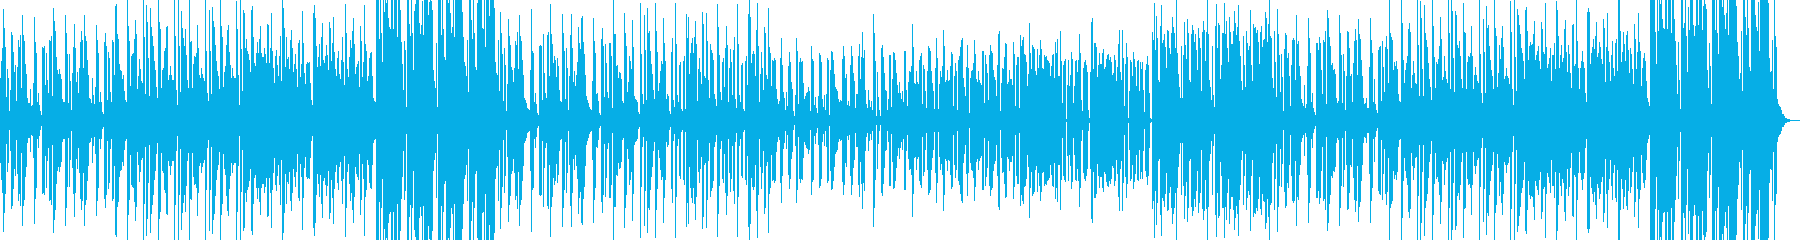 s005 へなちょこボス登場曲の再生済みの波形